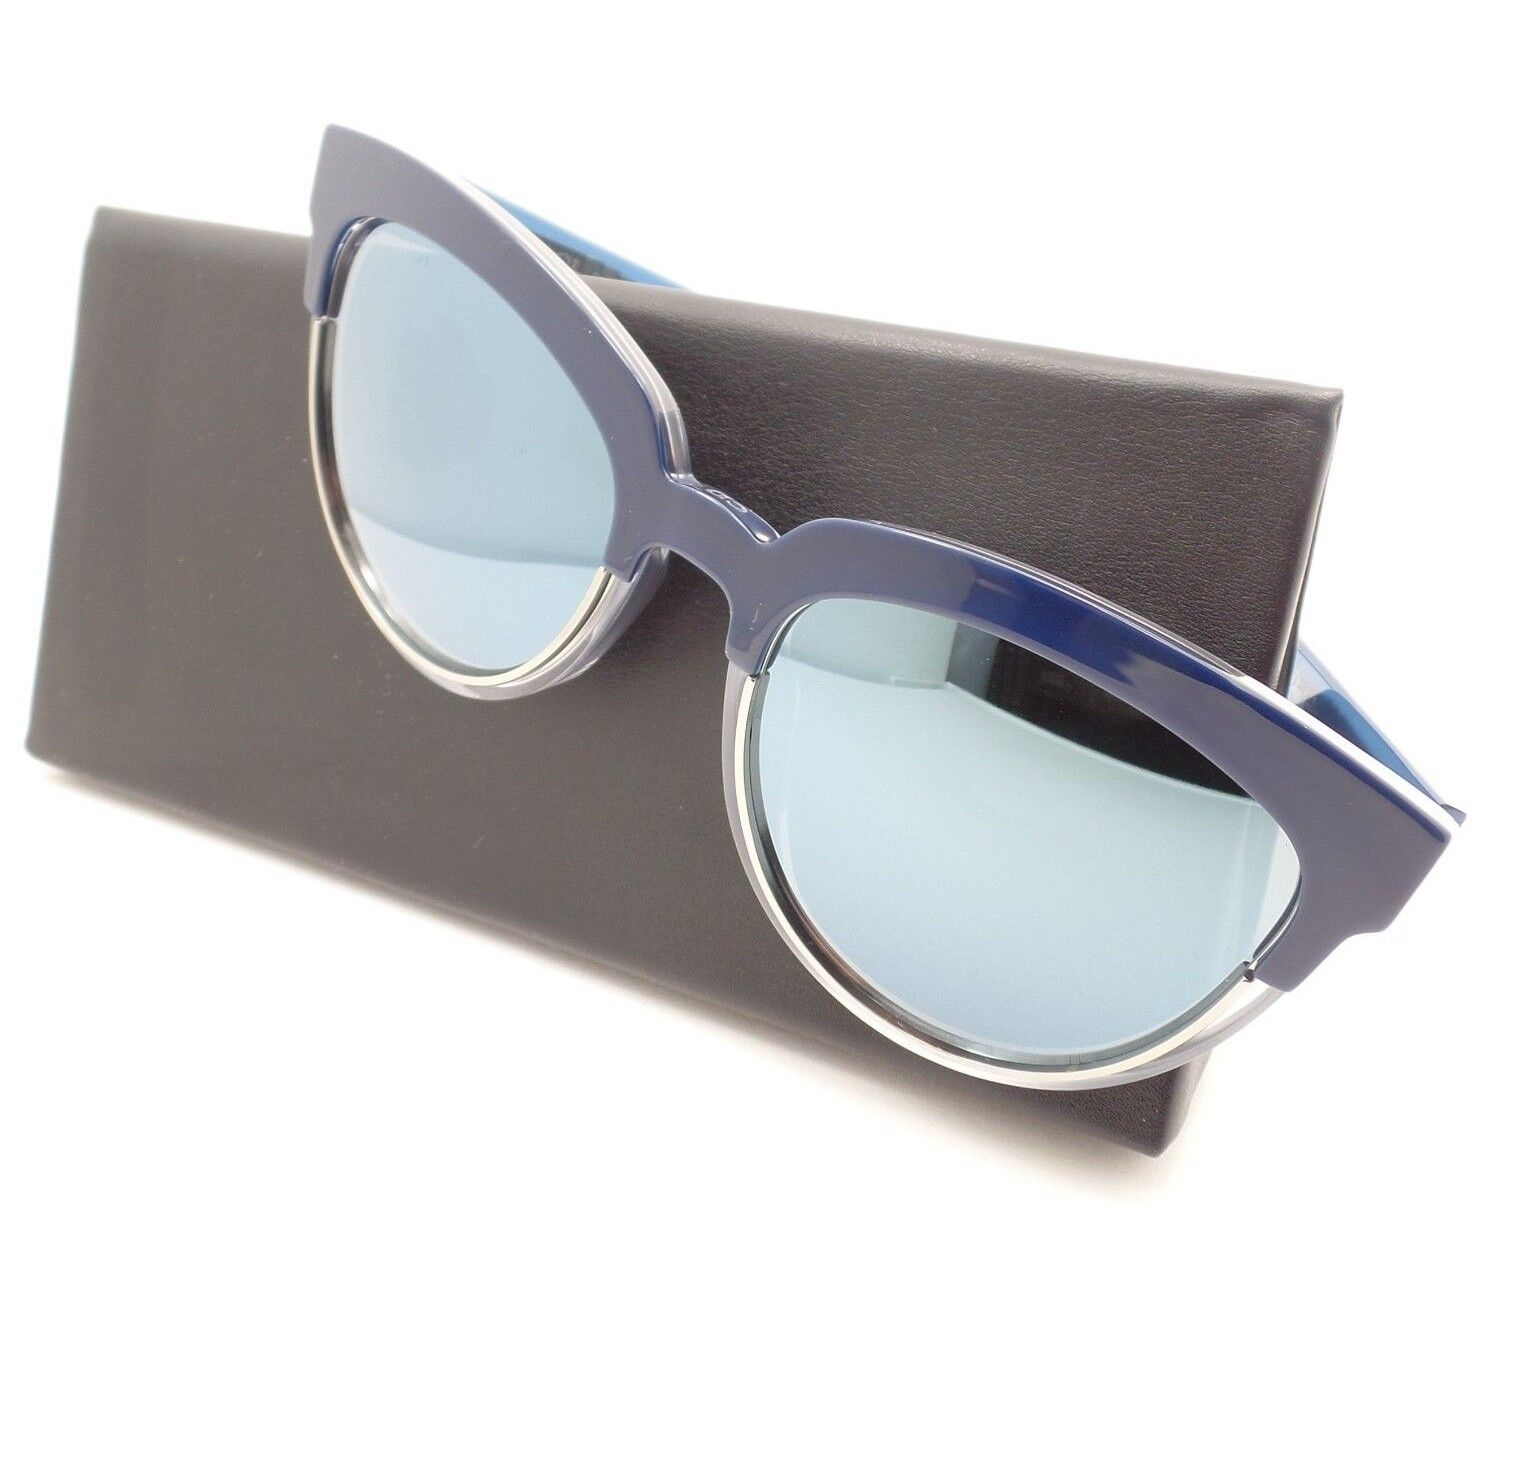 d6ec9bac11580 Christian Dior Sight 1 Rent7 Blue Crystal Blue Mirror Sunglasses ...